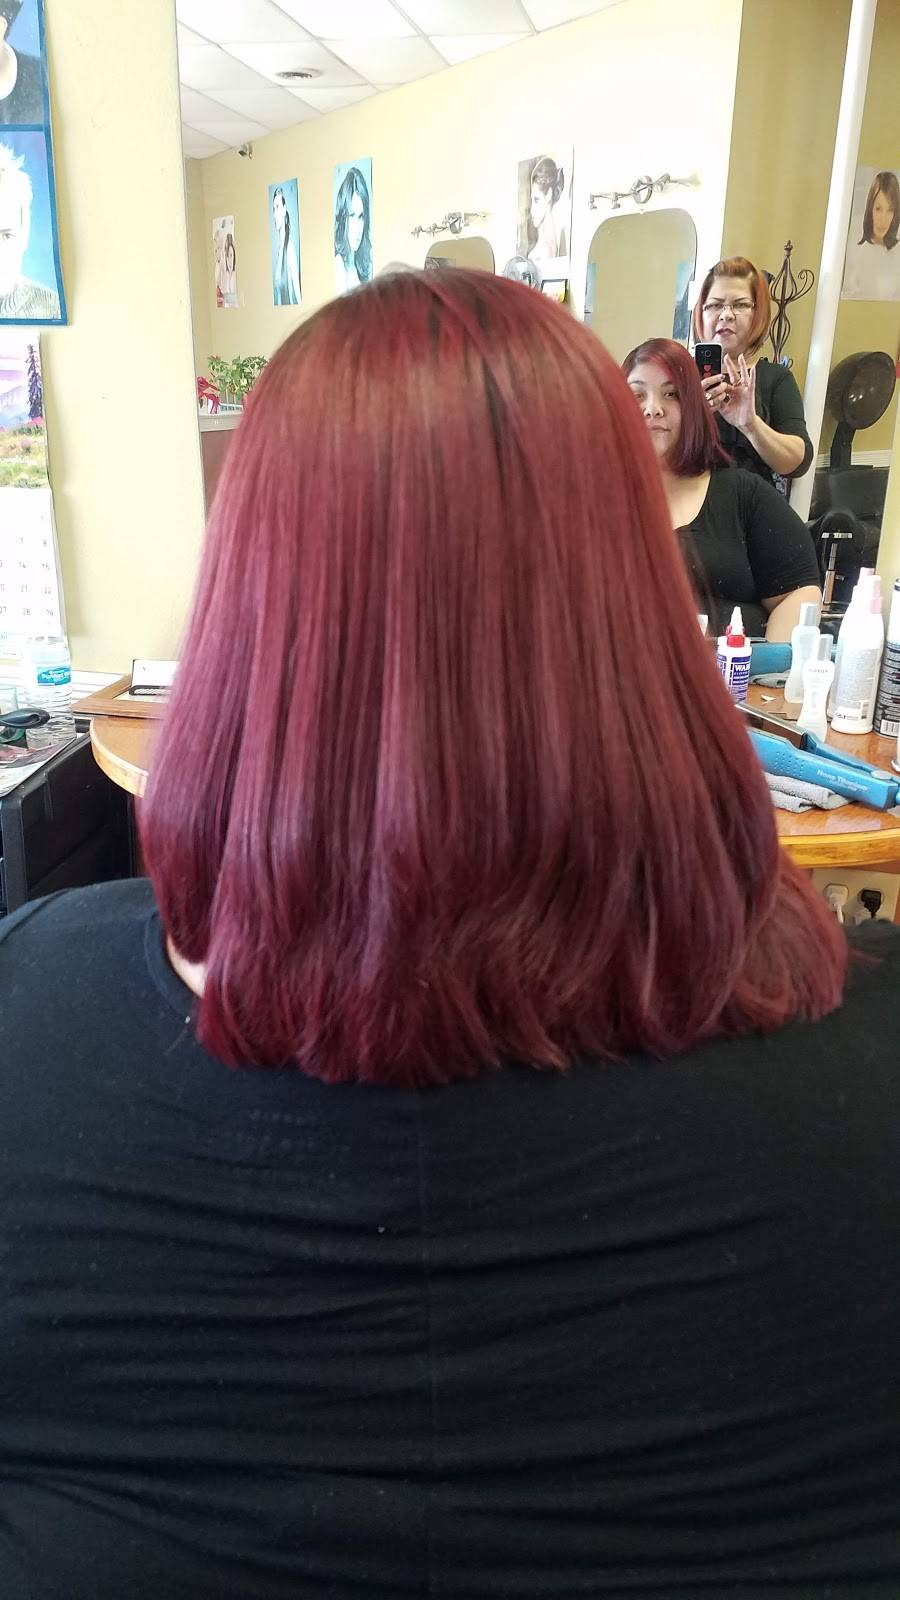 Creative Salon - hair care    Photo 3 of 4   Address: 3512 Altamesa Blvd, Fort Worth, TX 76133, USA   Phone: (817) 370-0788